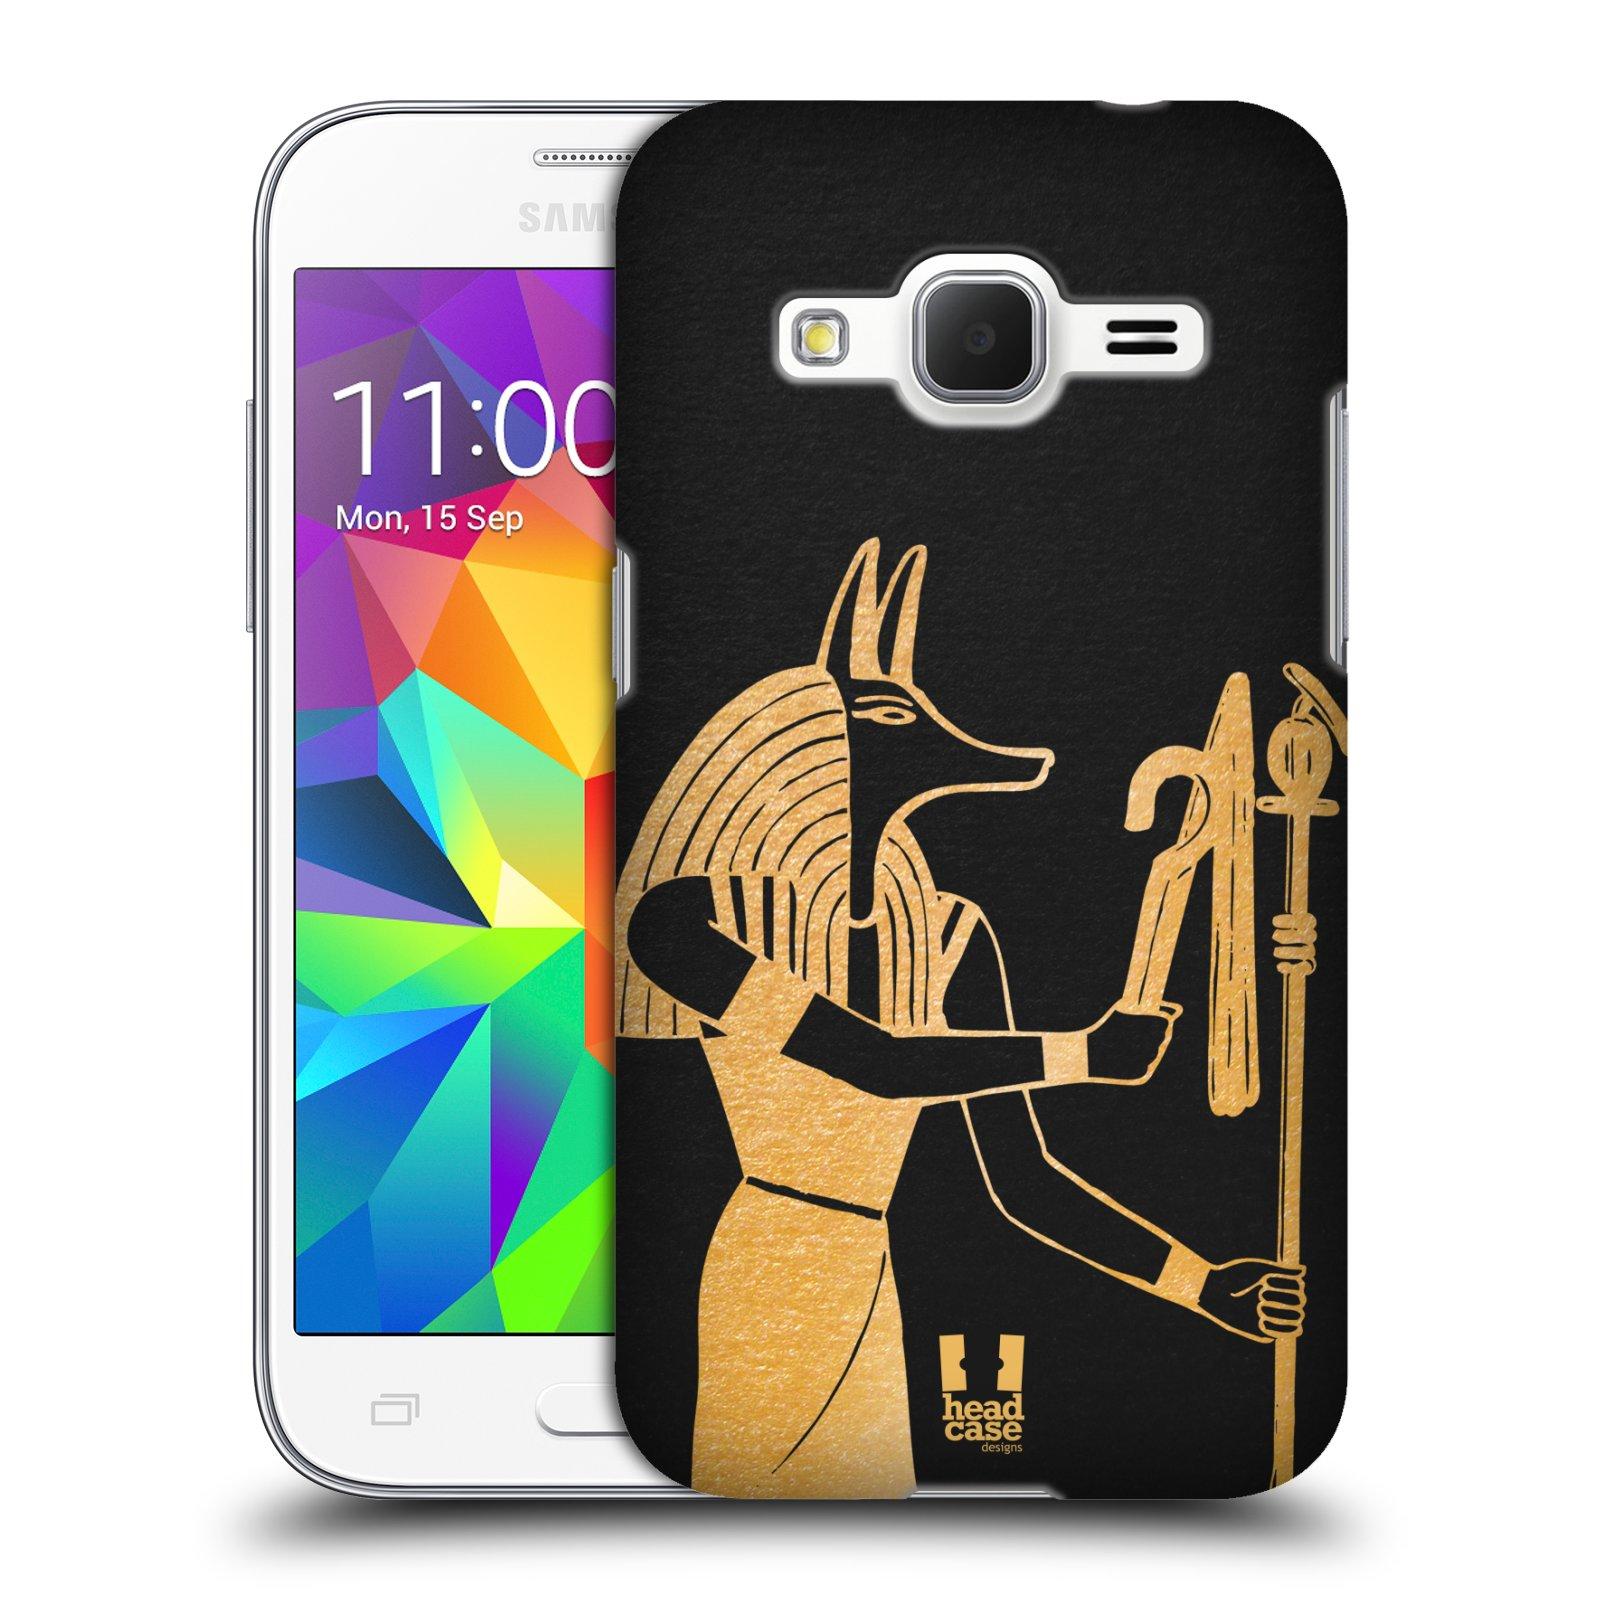 Plastové pouzdro na mobil Samsung Galaxy Core Prime VE HEAD CASE EGYPT ANUBIS (Kryt či obal na mobilní telefon Samsung Galaxy Core Prime LTE VE SM-G361F)